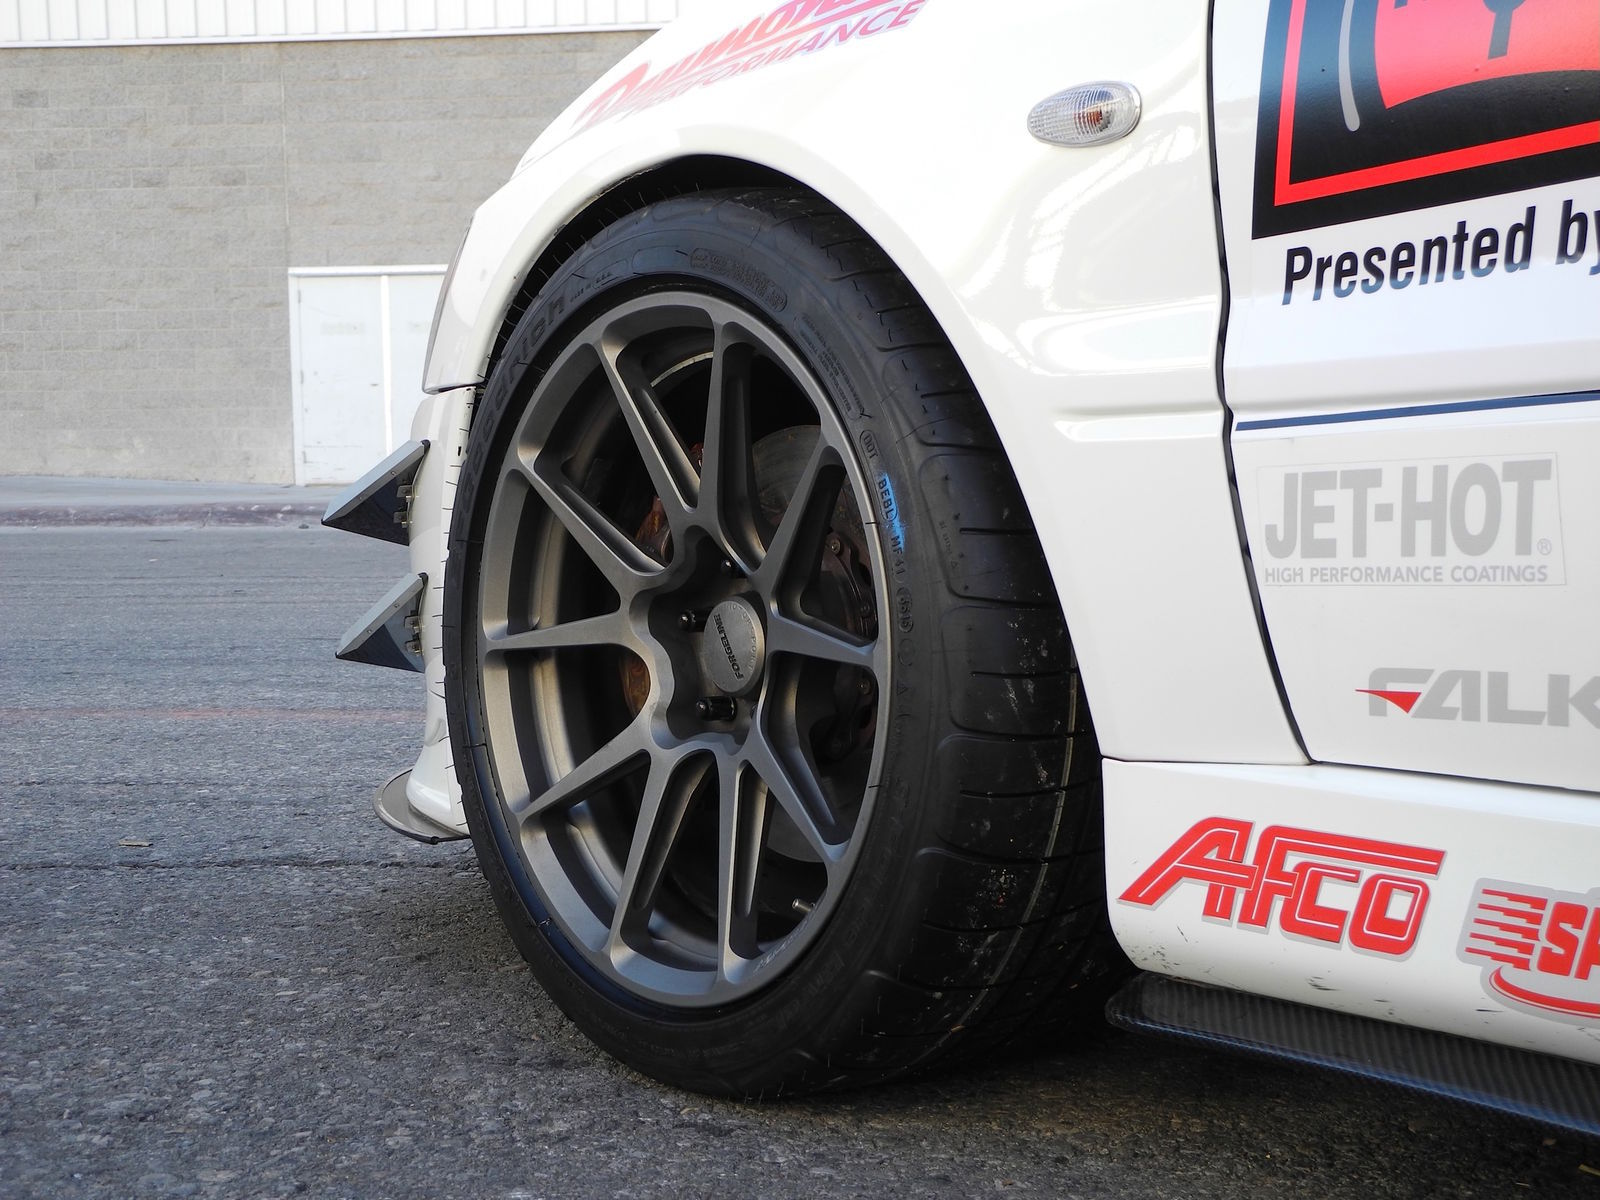 2006 Mitsubishi Lancer Evolution   Showtime Motorsports Evo on Forgeline GA1R Open Lug Wheels - Close Up Wheel Shot